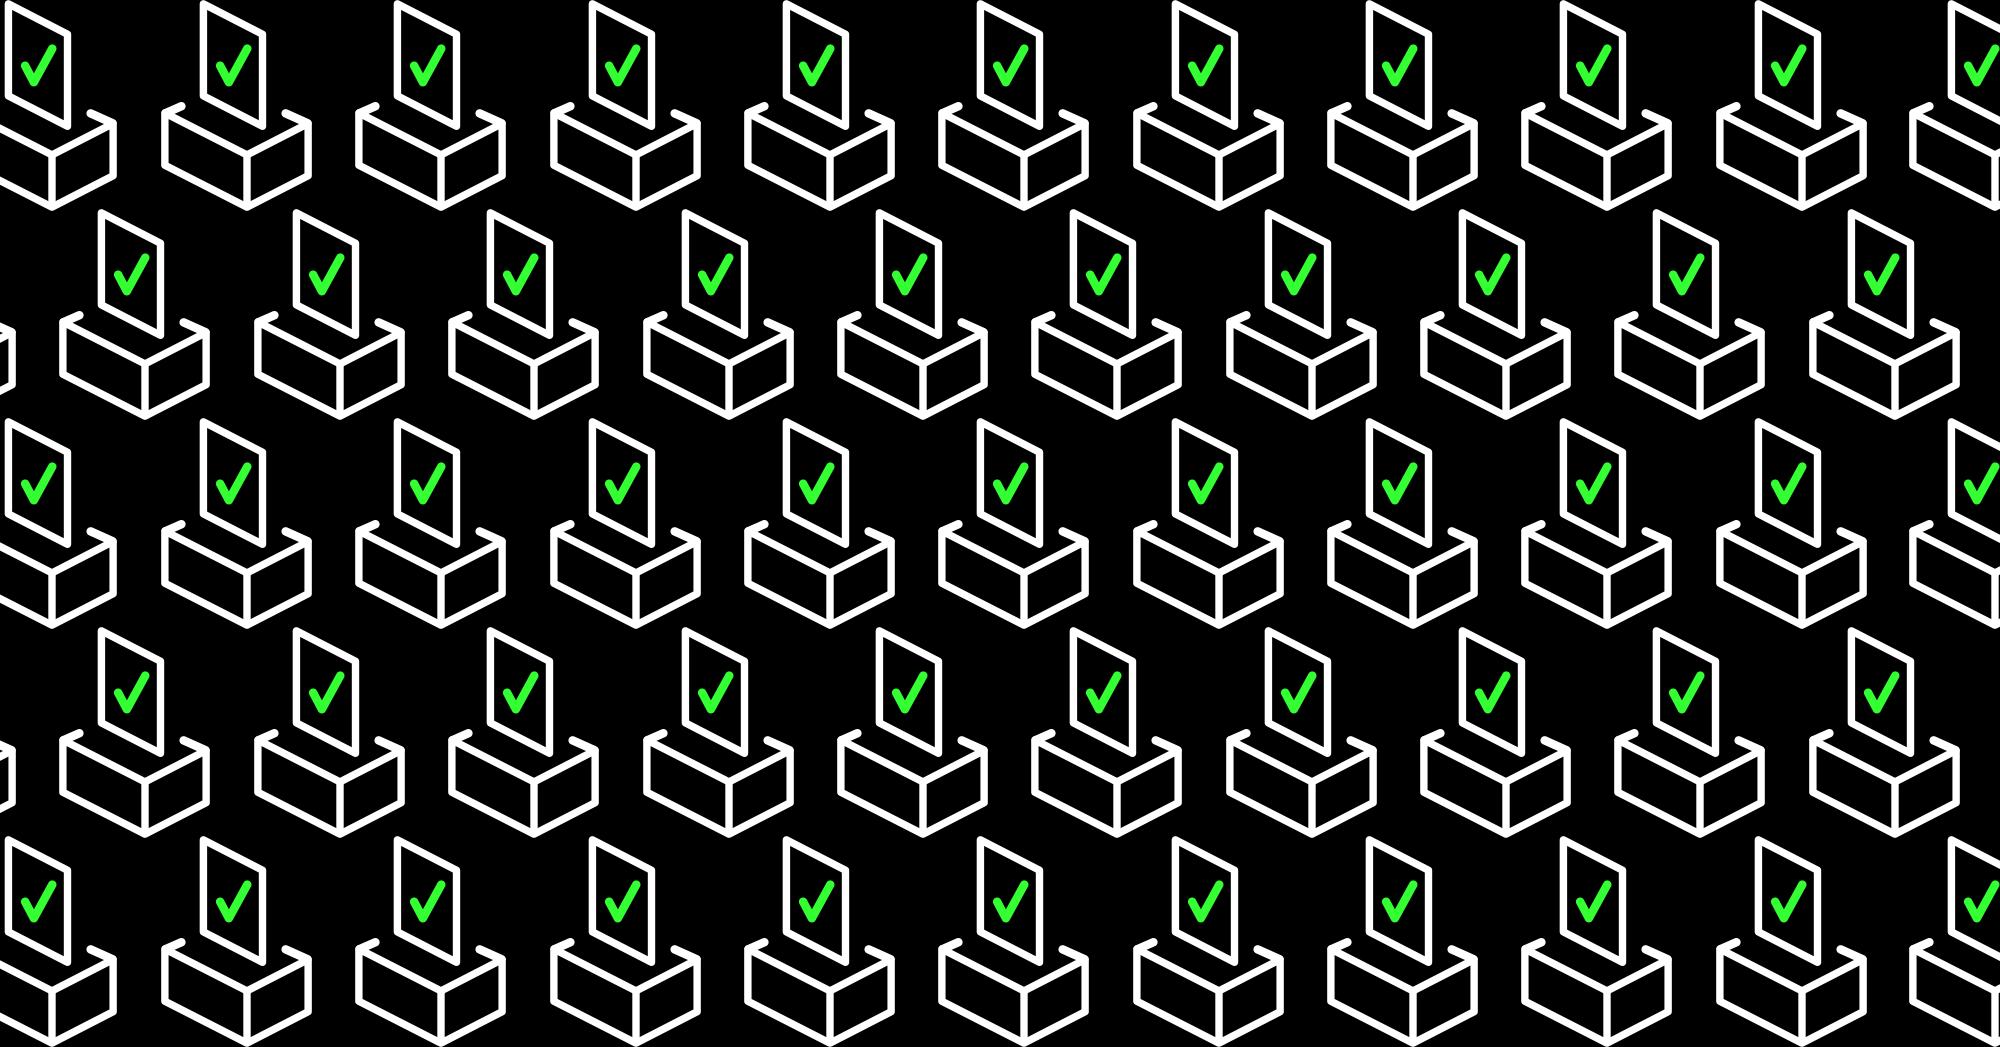 MITテクノロジーレビューが米大統領選を報じる理由